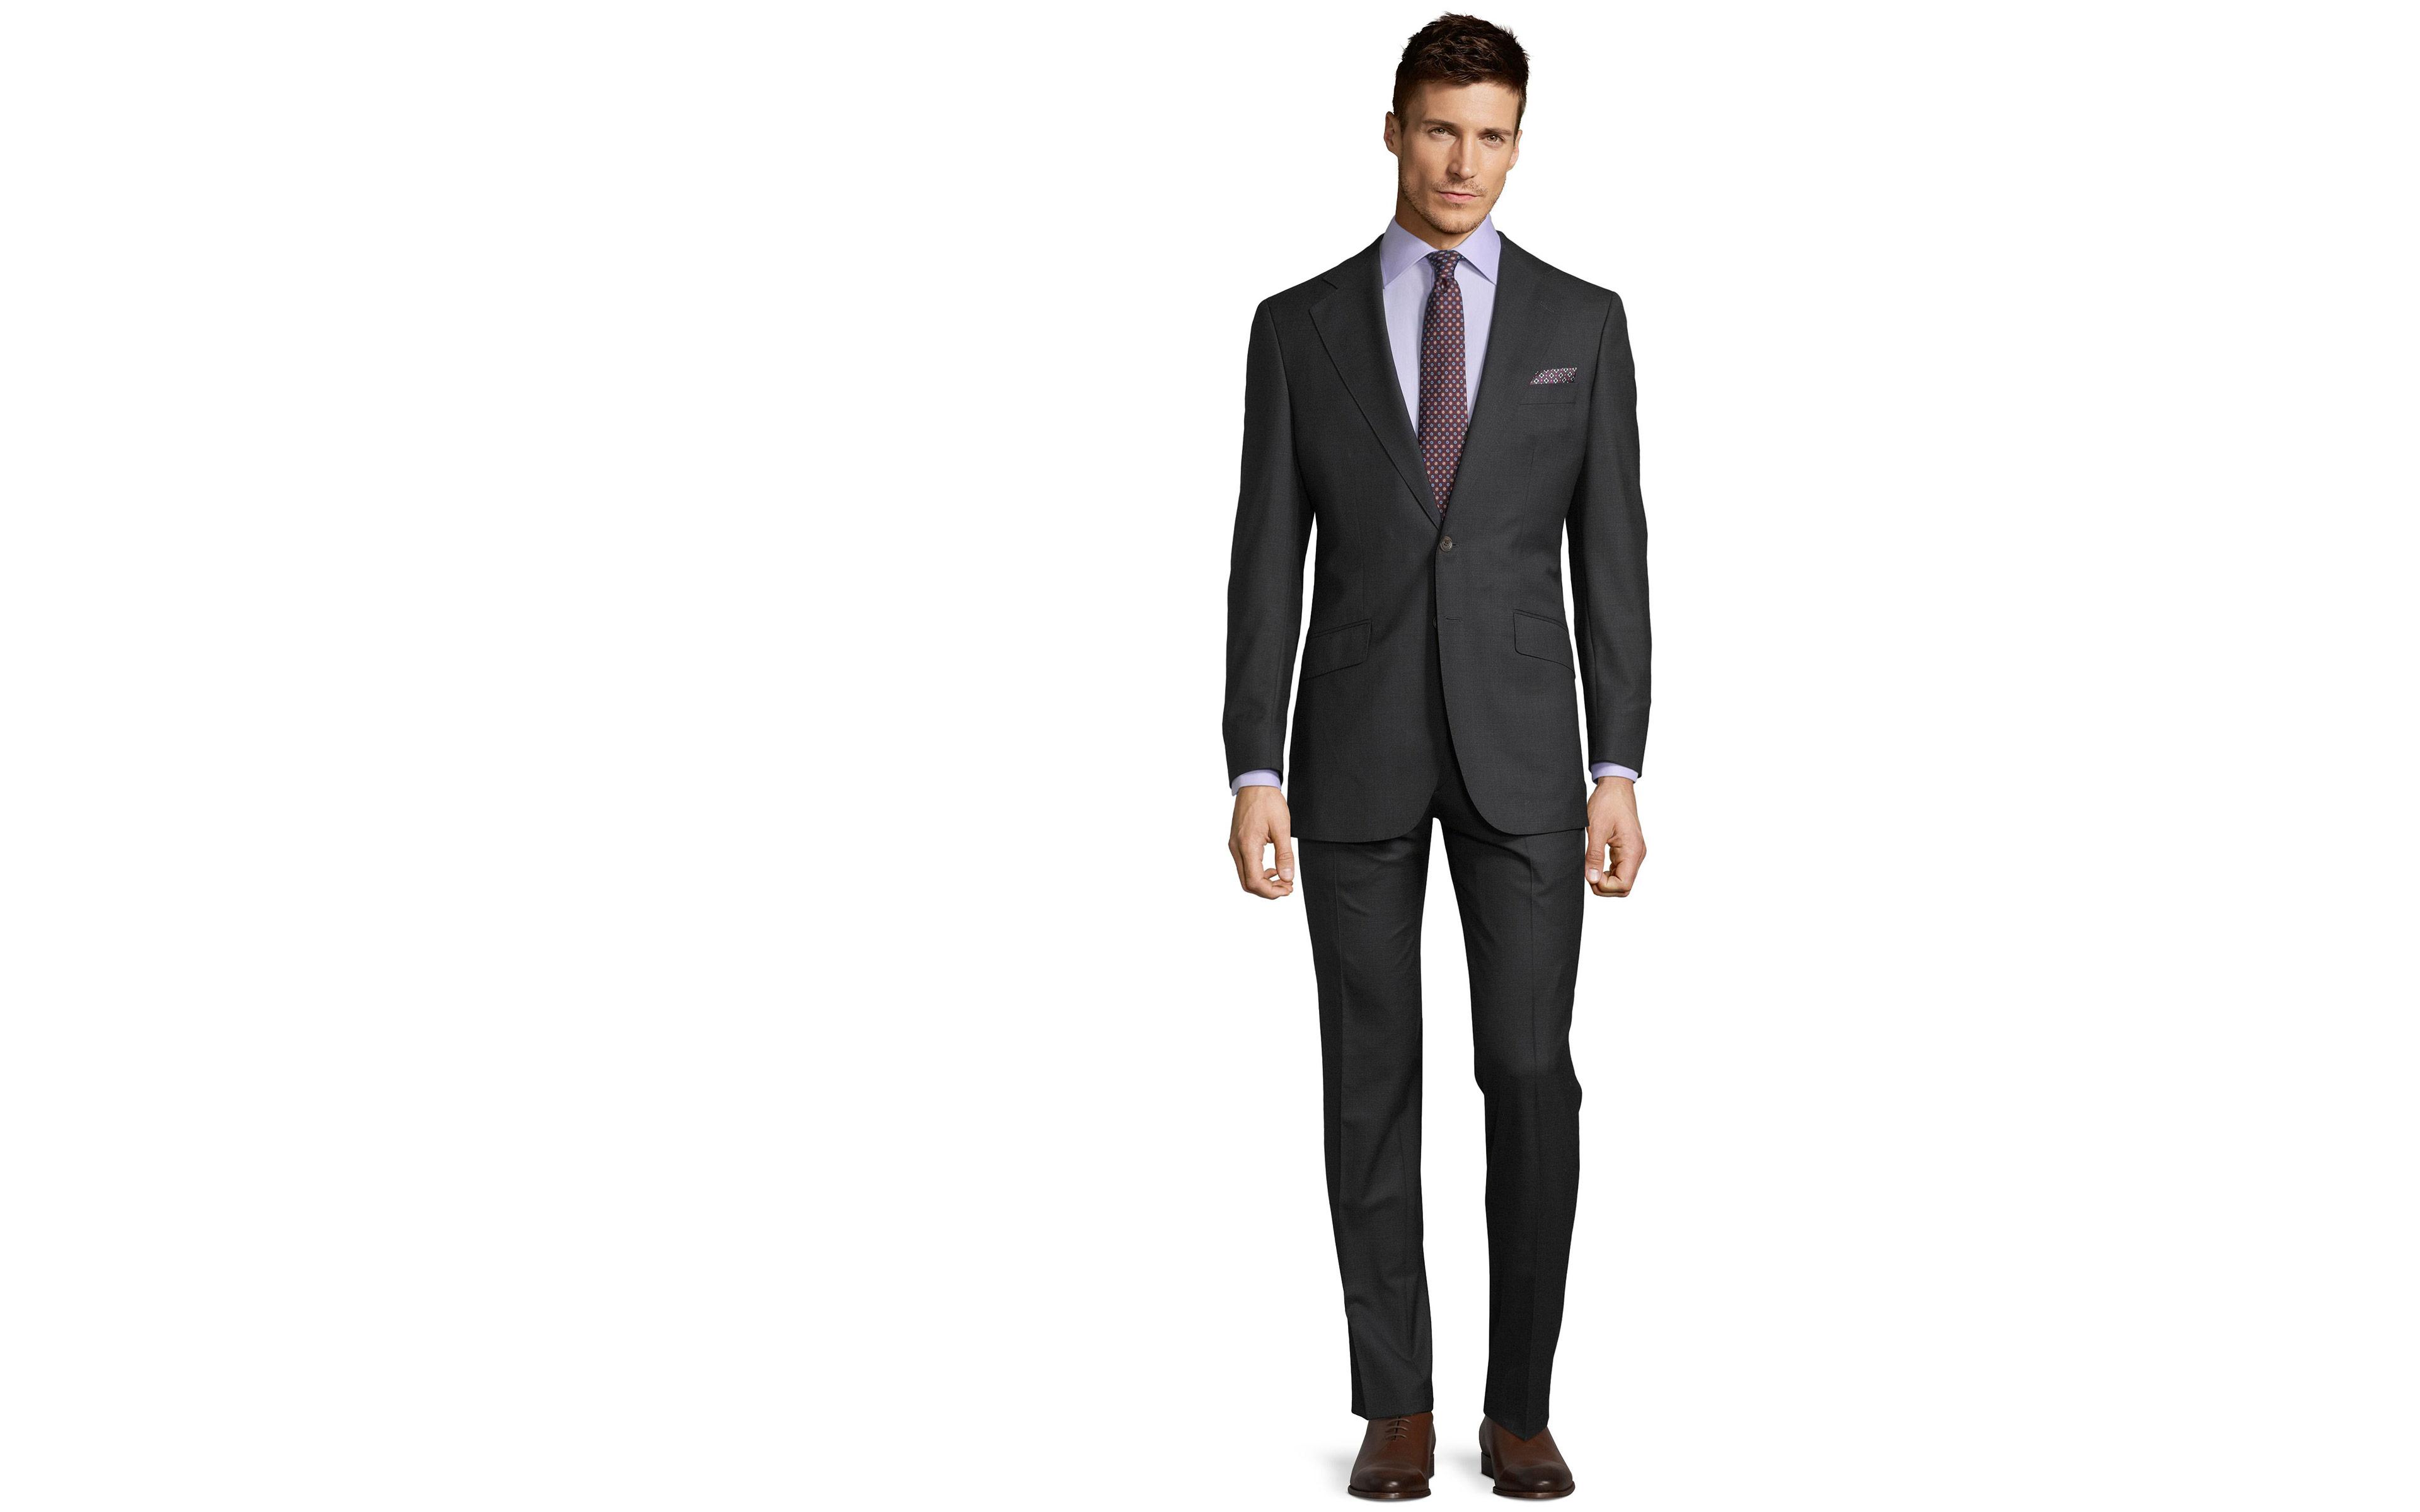 Vendetta Premium Charcoal Suit